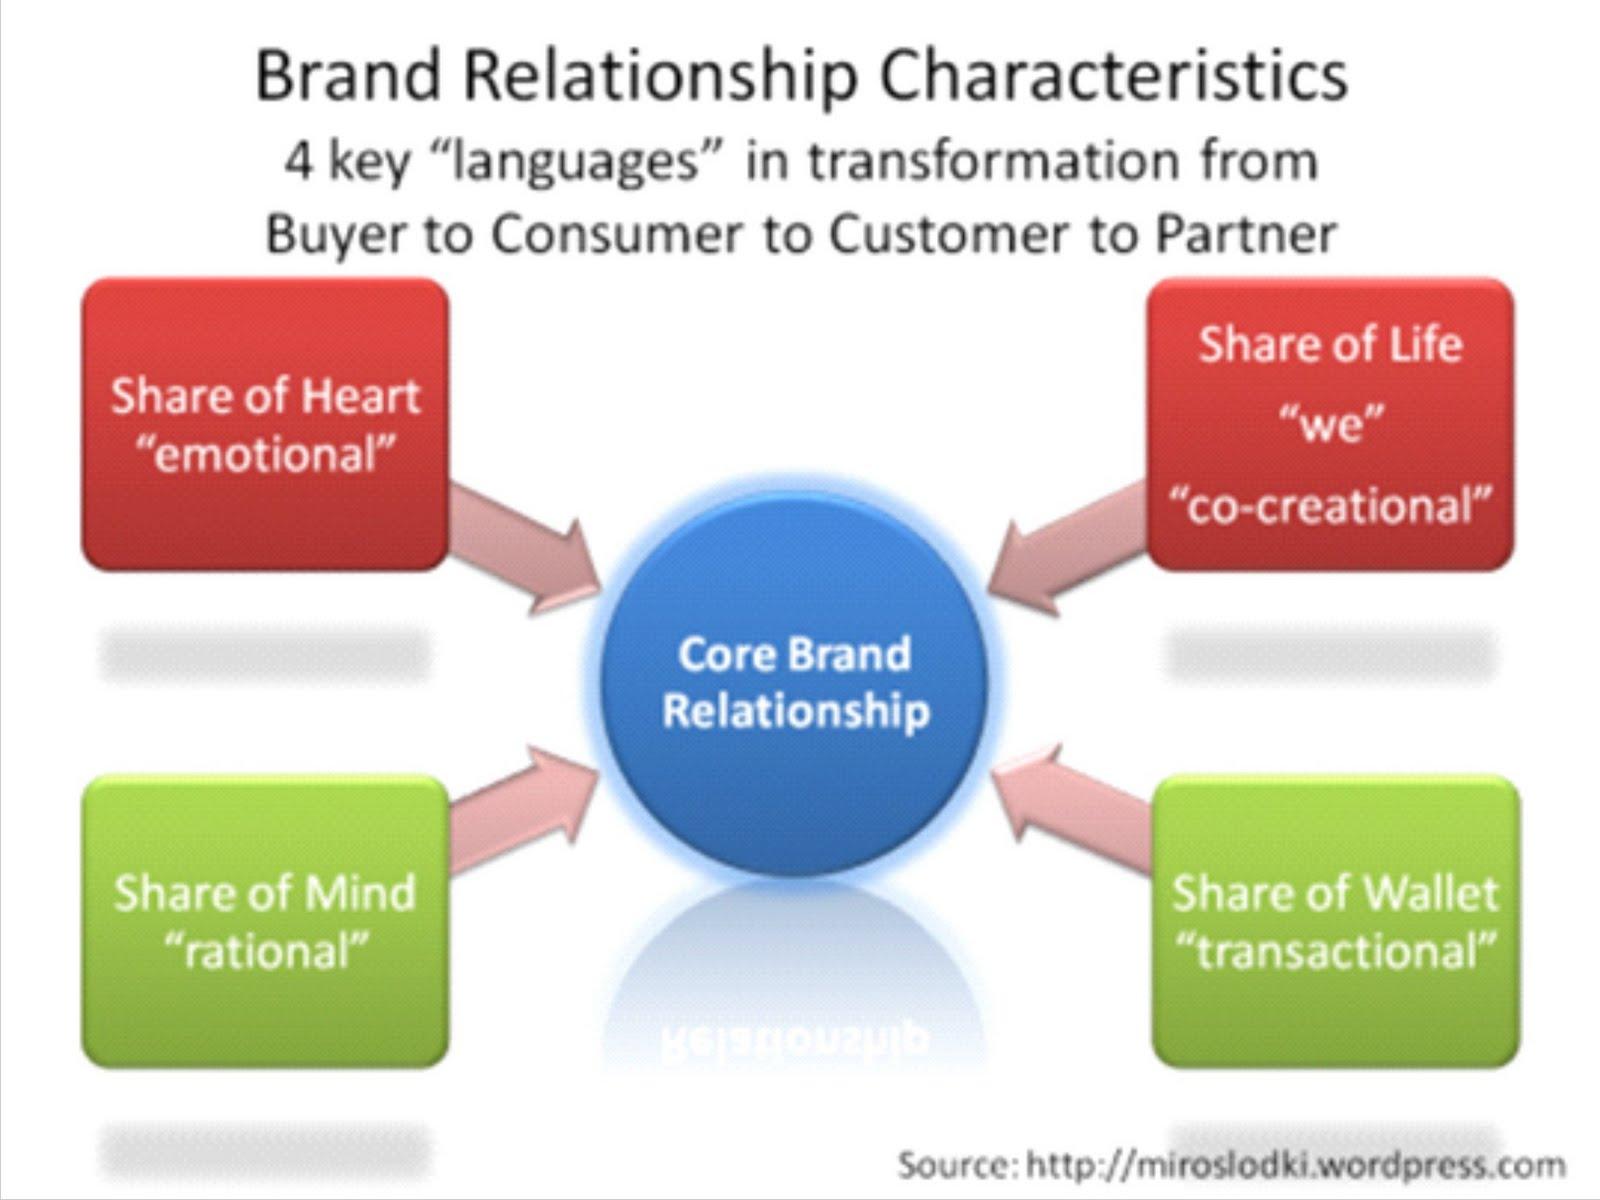 Iwan bhs nulis blog brand relationship characteristics brand relationship characteristics ccuart Choice Image